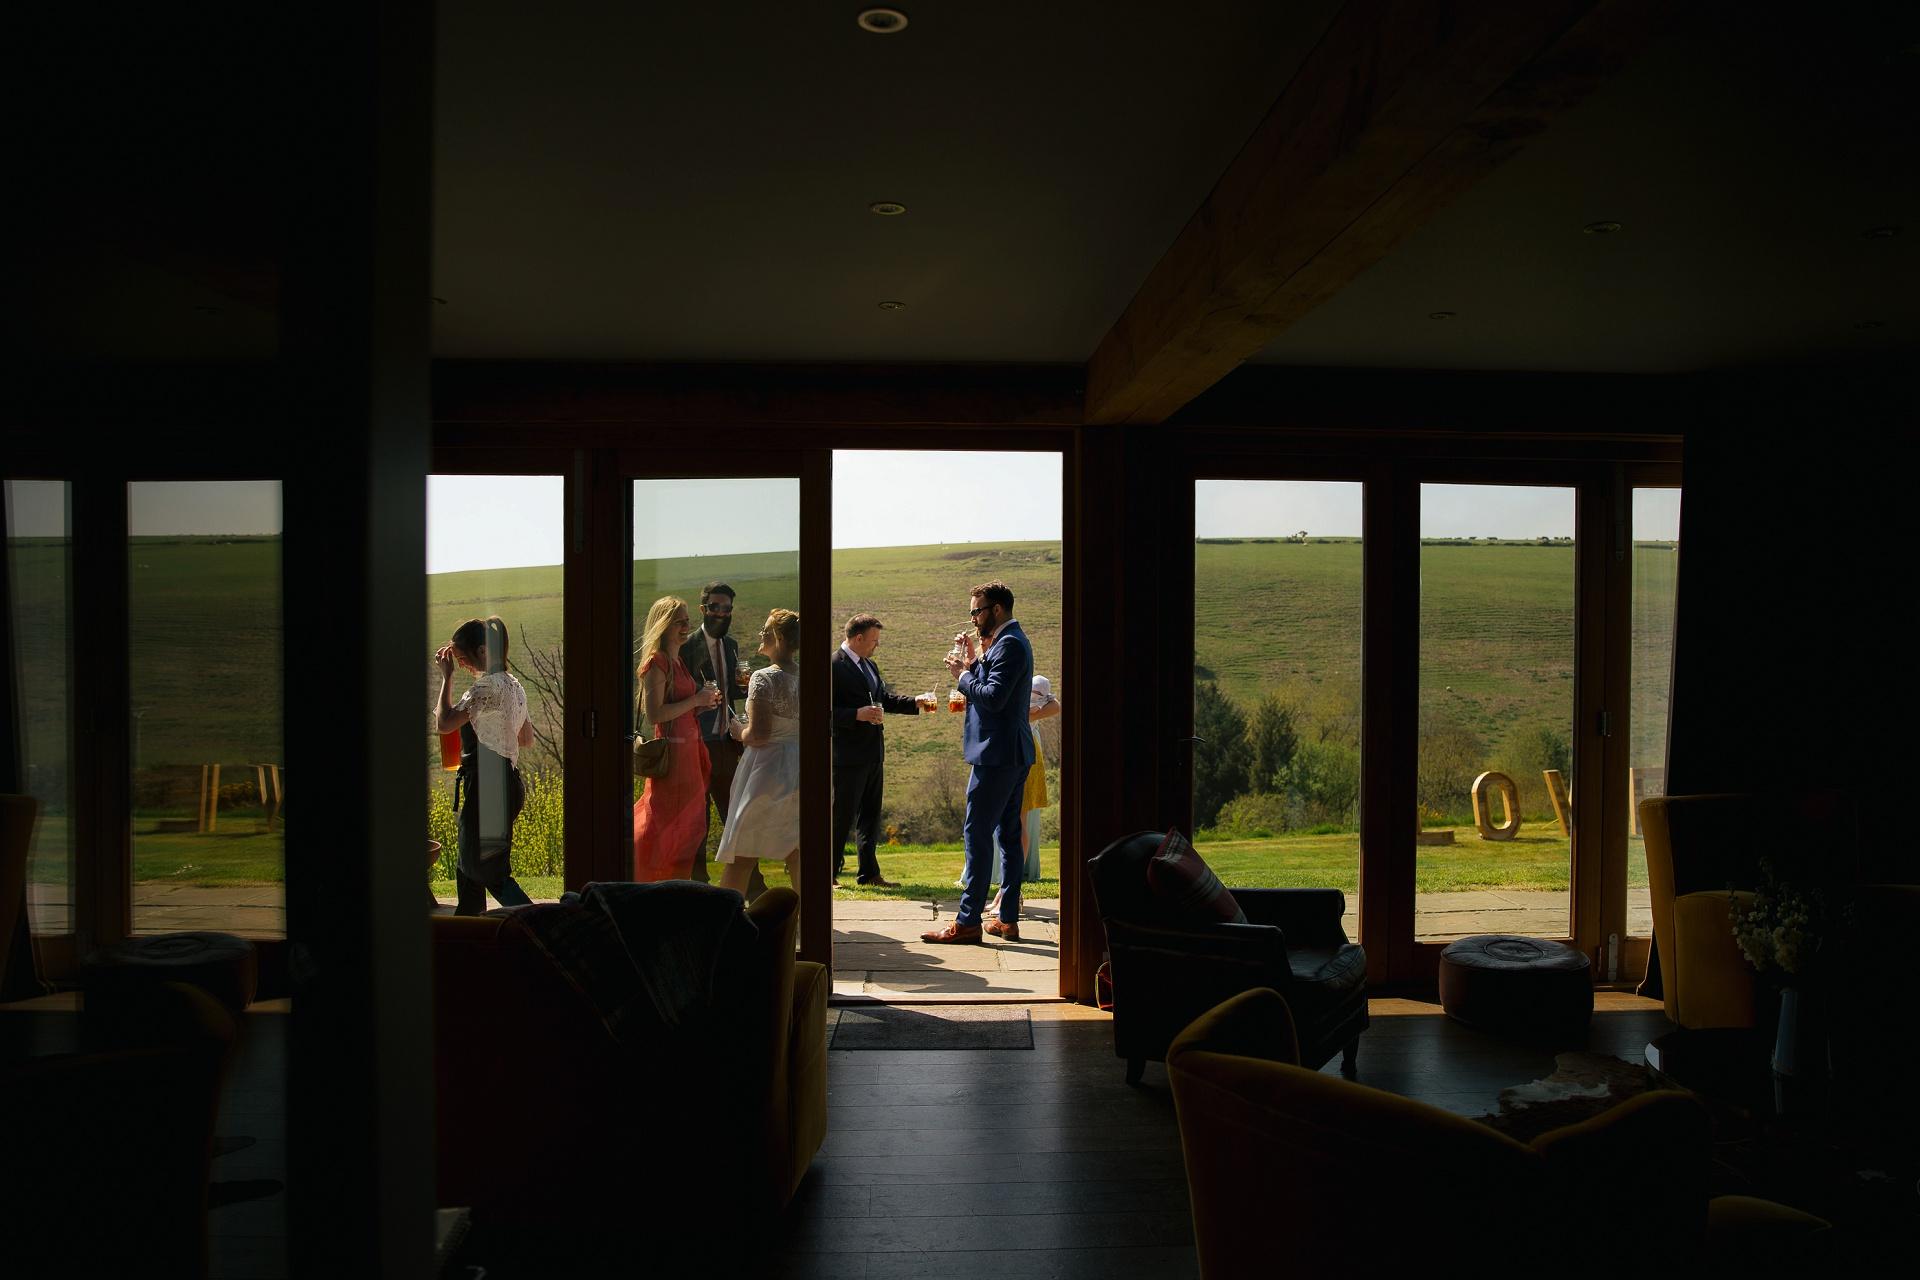 Tregulland weddings